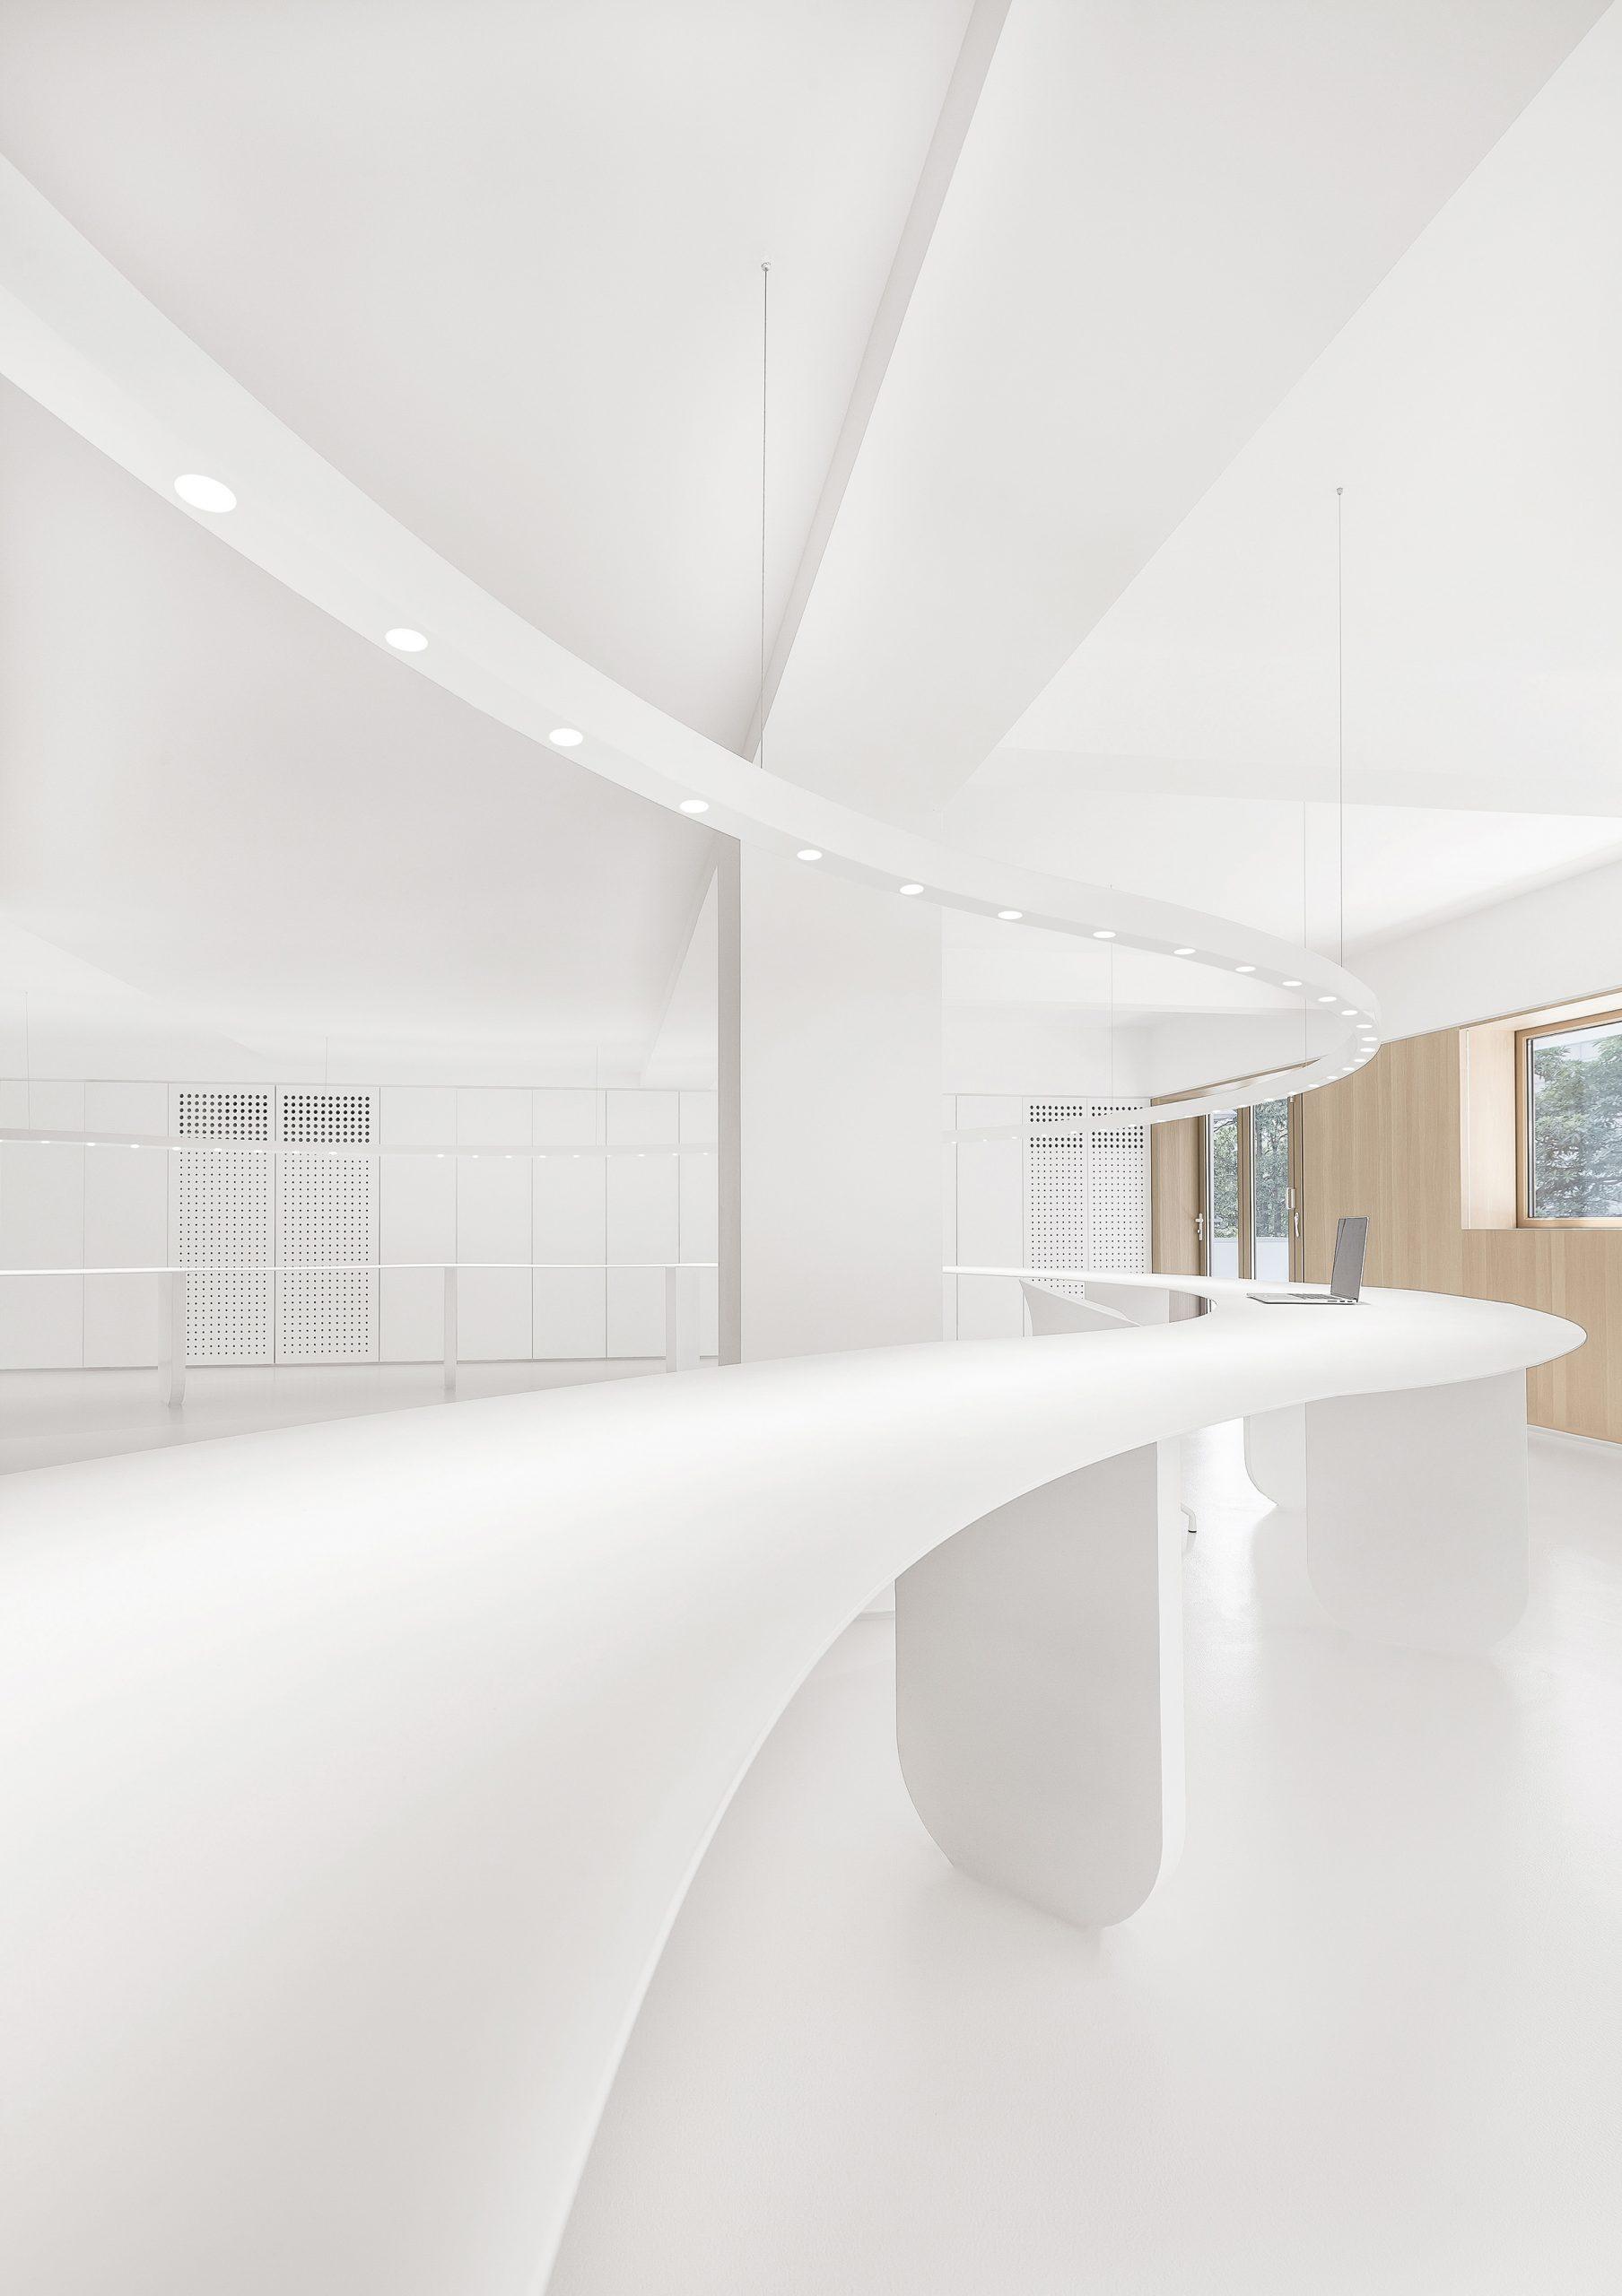 CUN|PANDA, a new office space in Xiamen